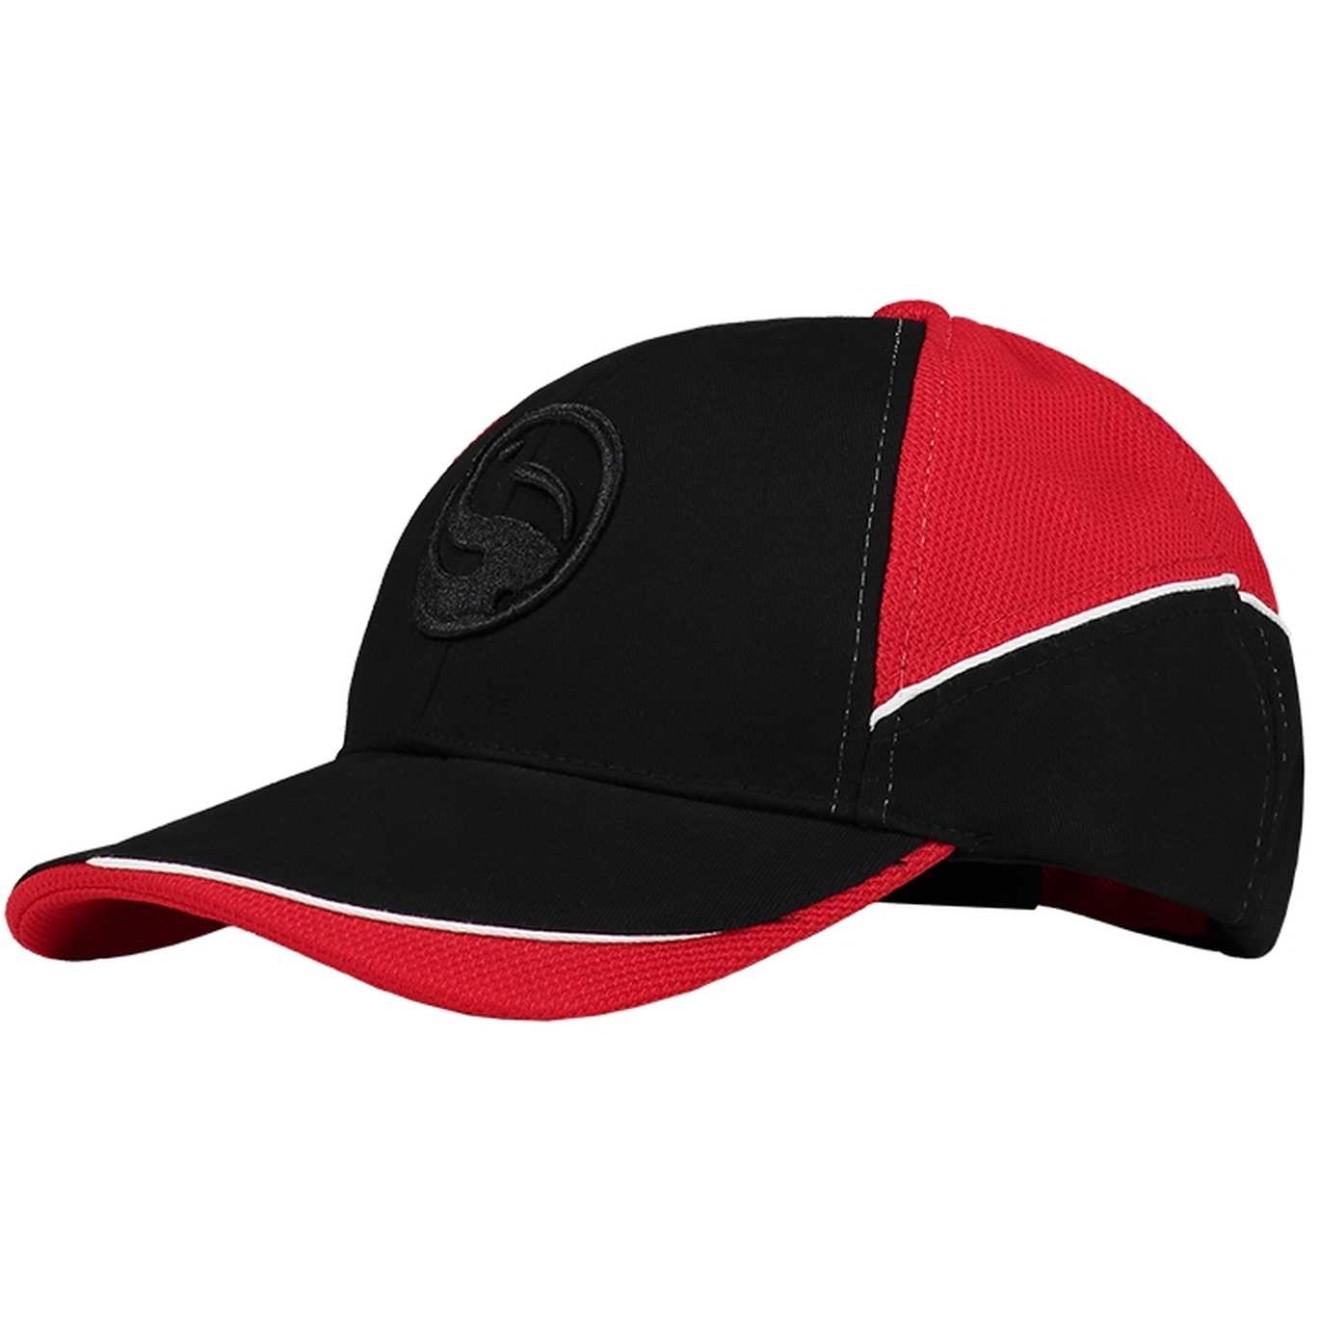 Guru Claw Trucker//Curveball Baseball Cap Hat